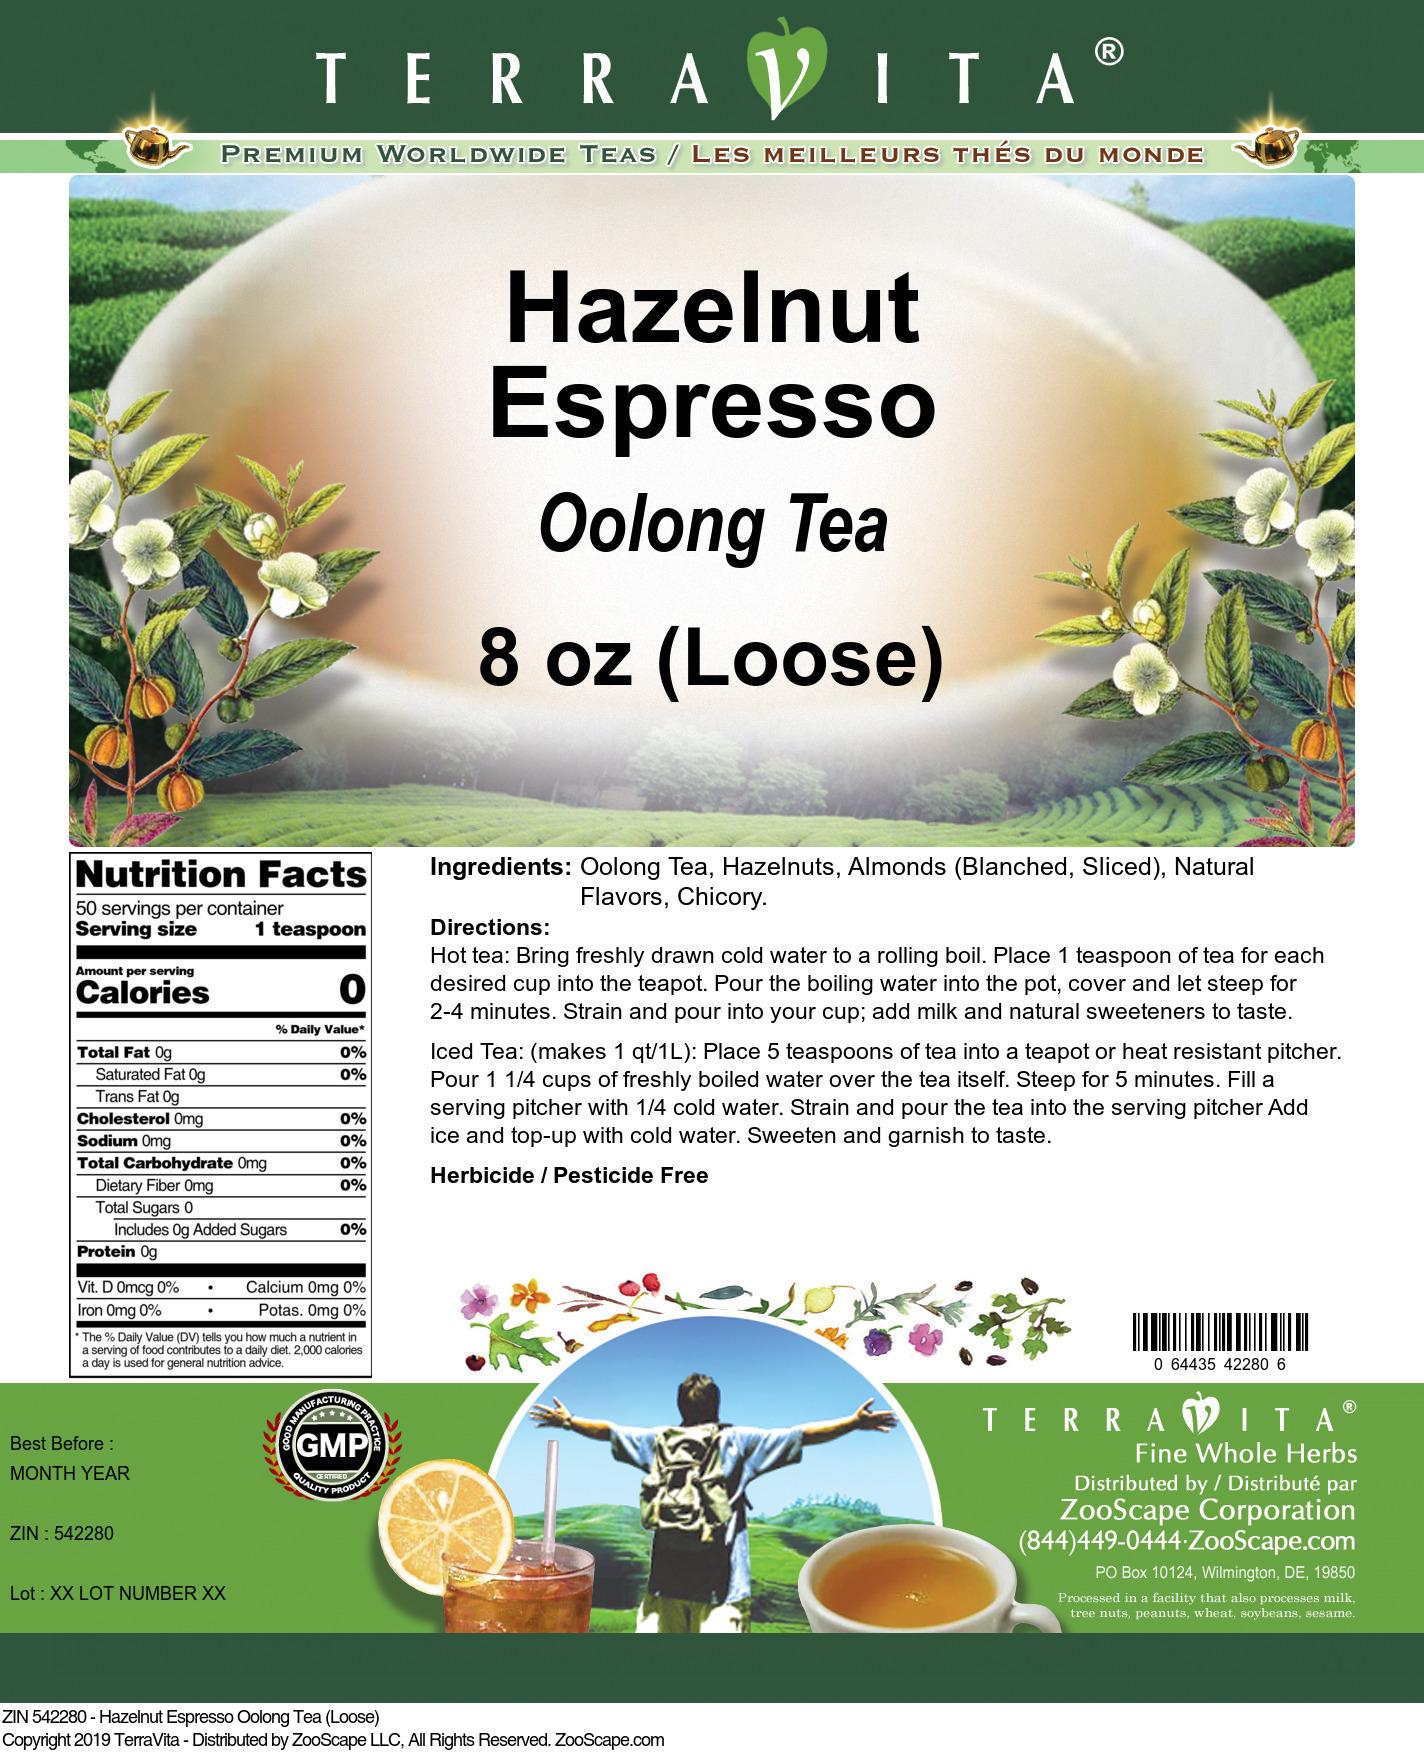 Hazelnut Espresso Oolong Tea